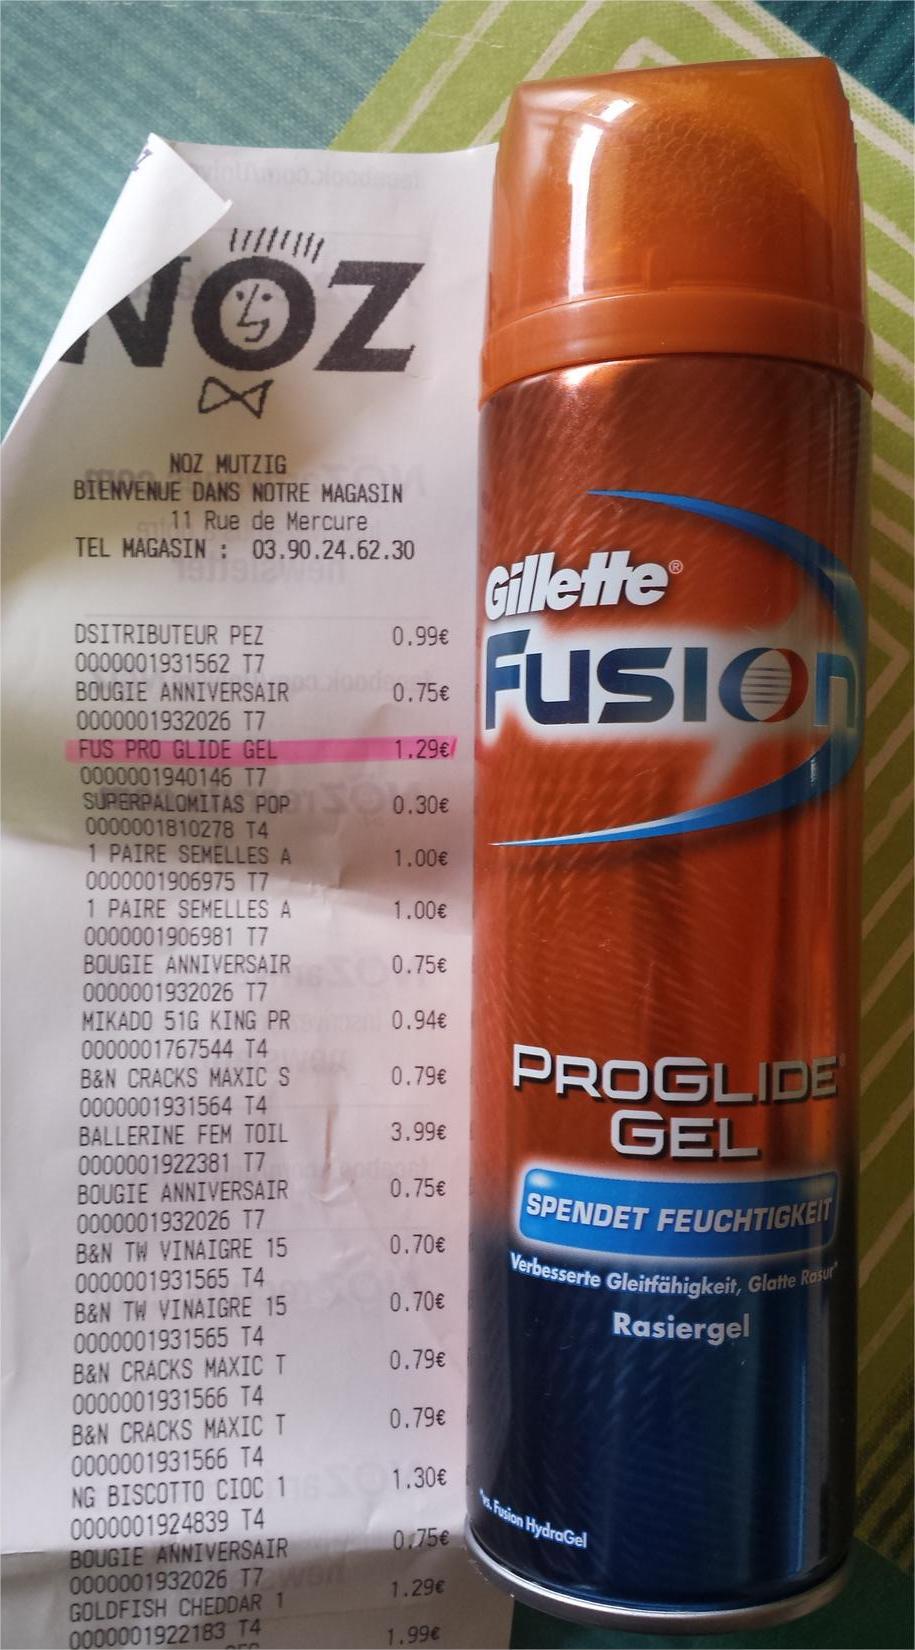 Gel à raser Gillette Fusion Proglide